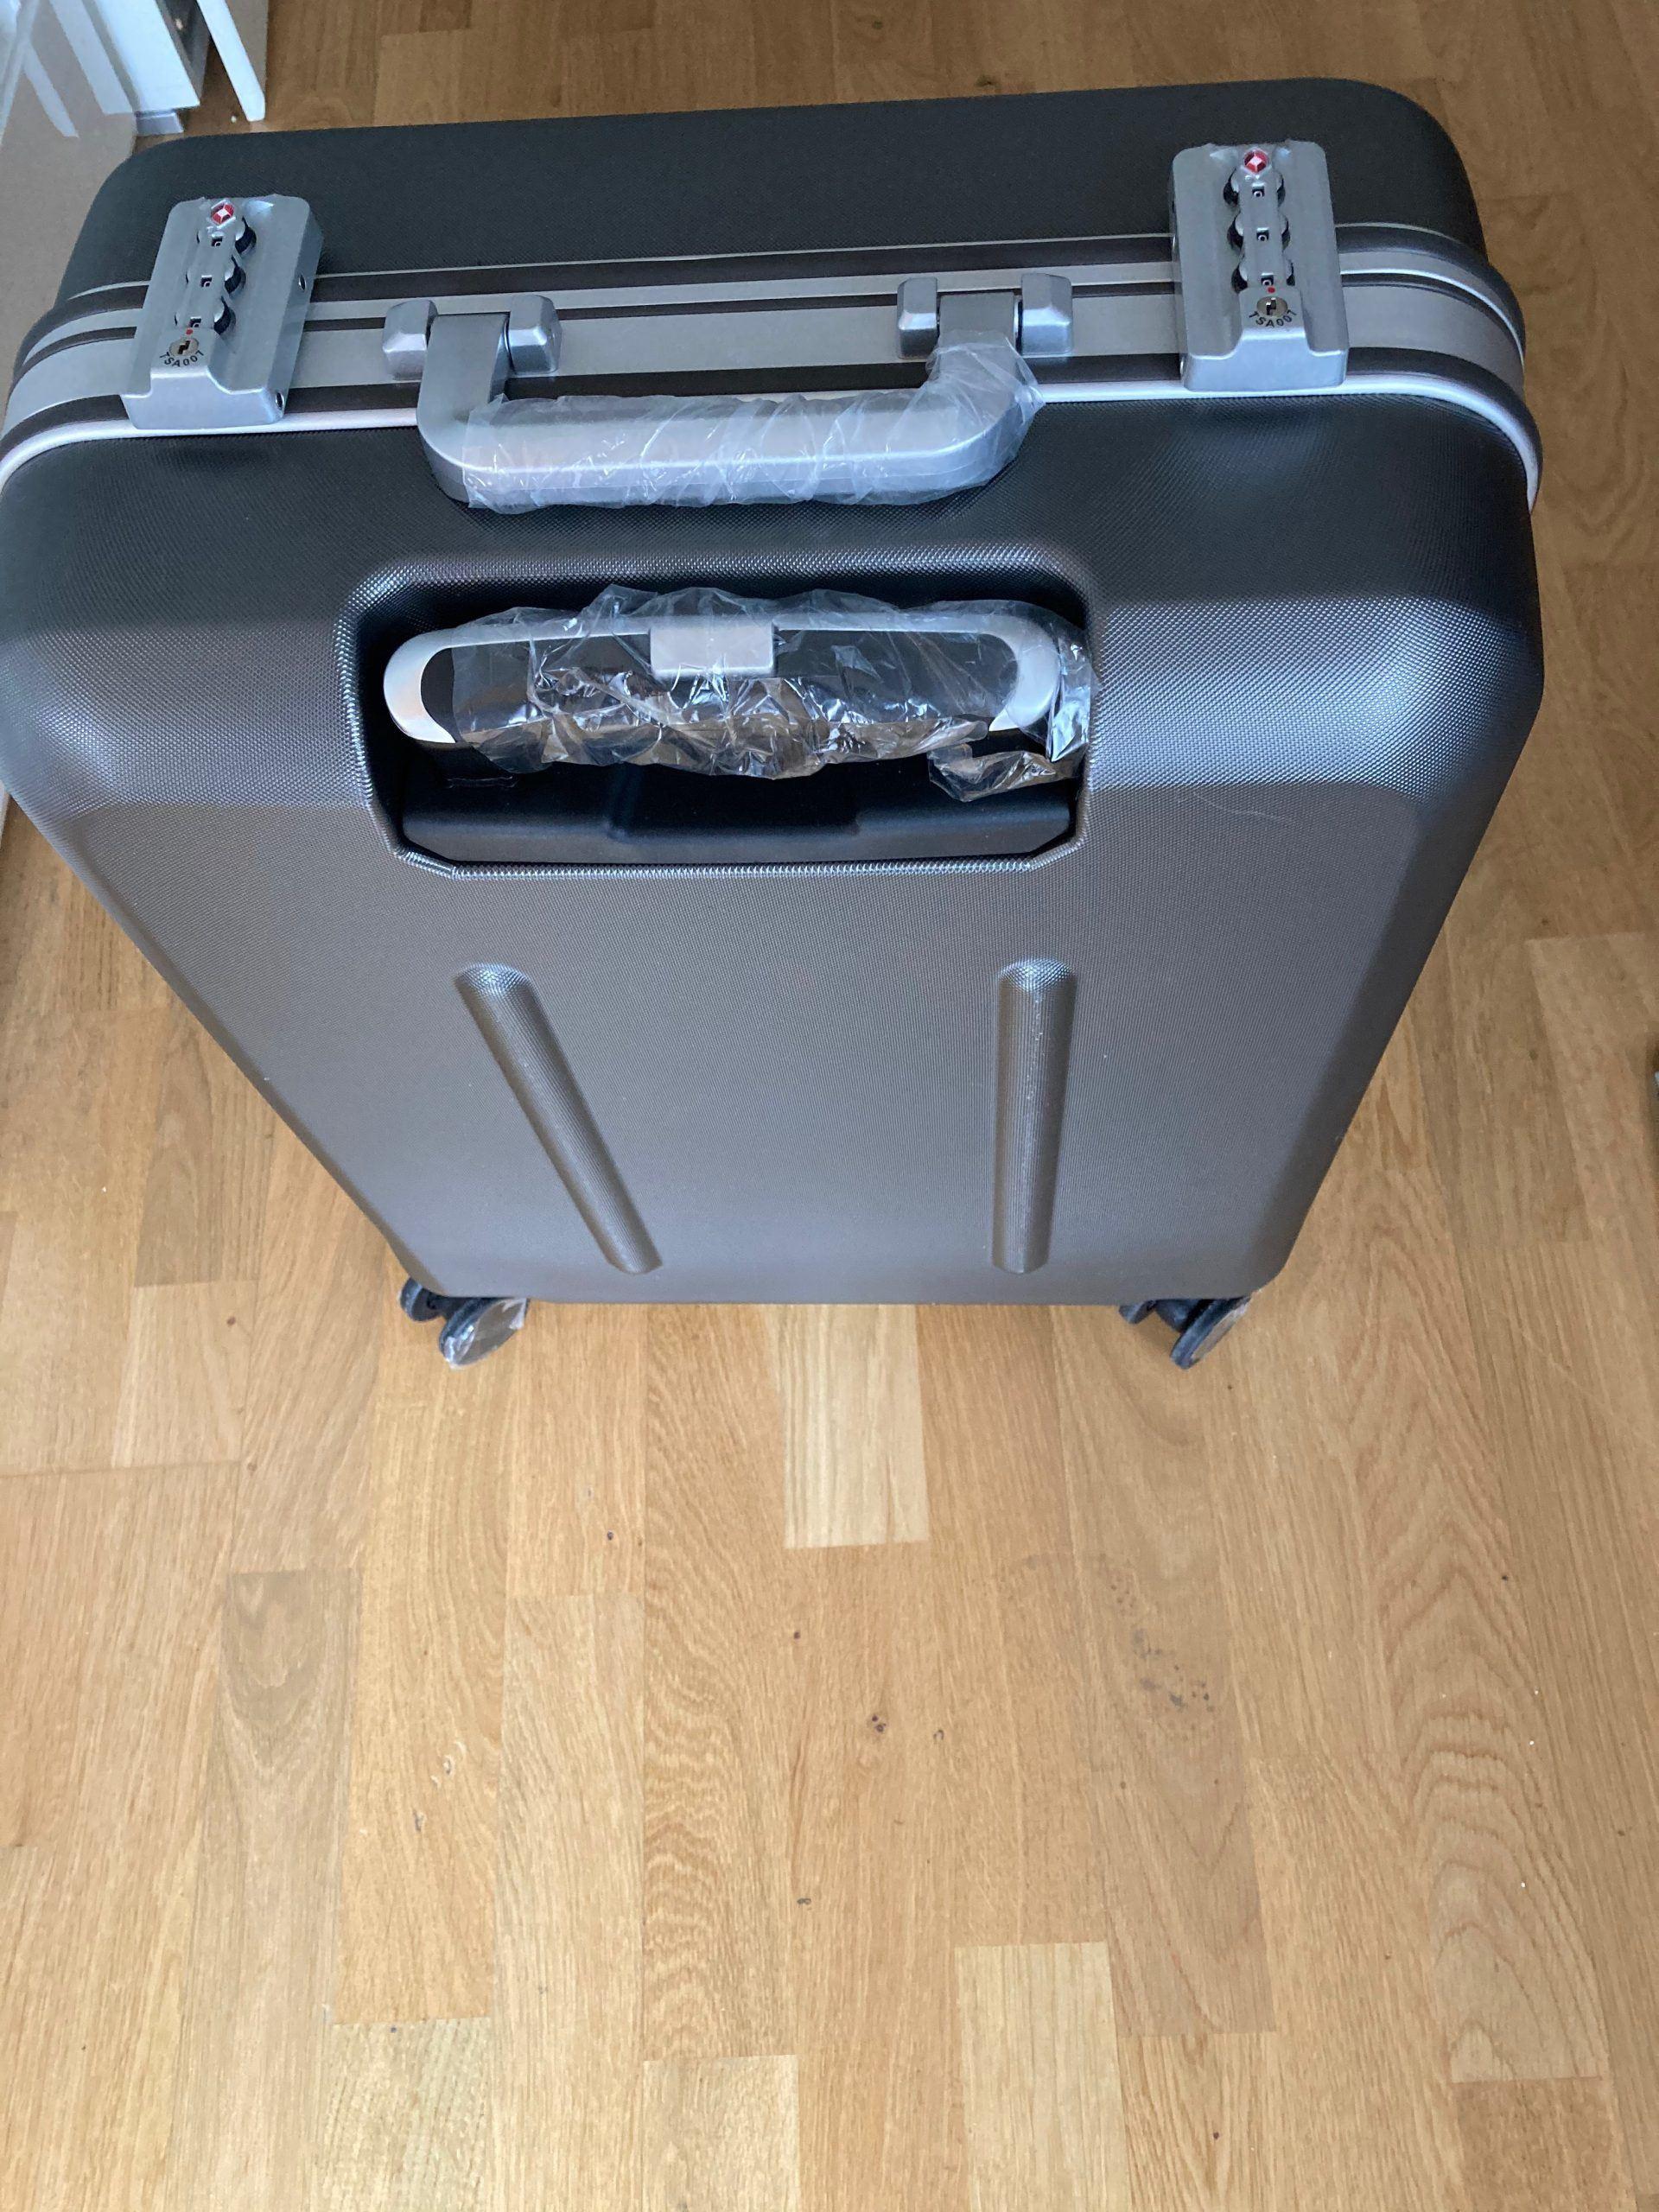 Test des tragbaren Ultraschallgeräts Wisonic Clover 60